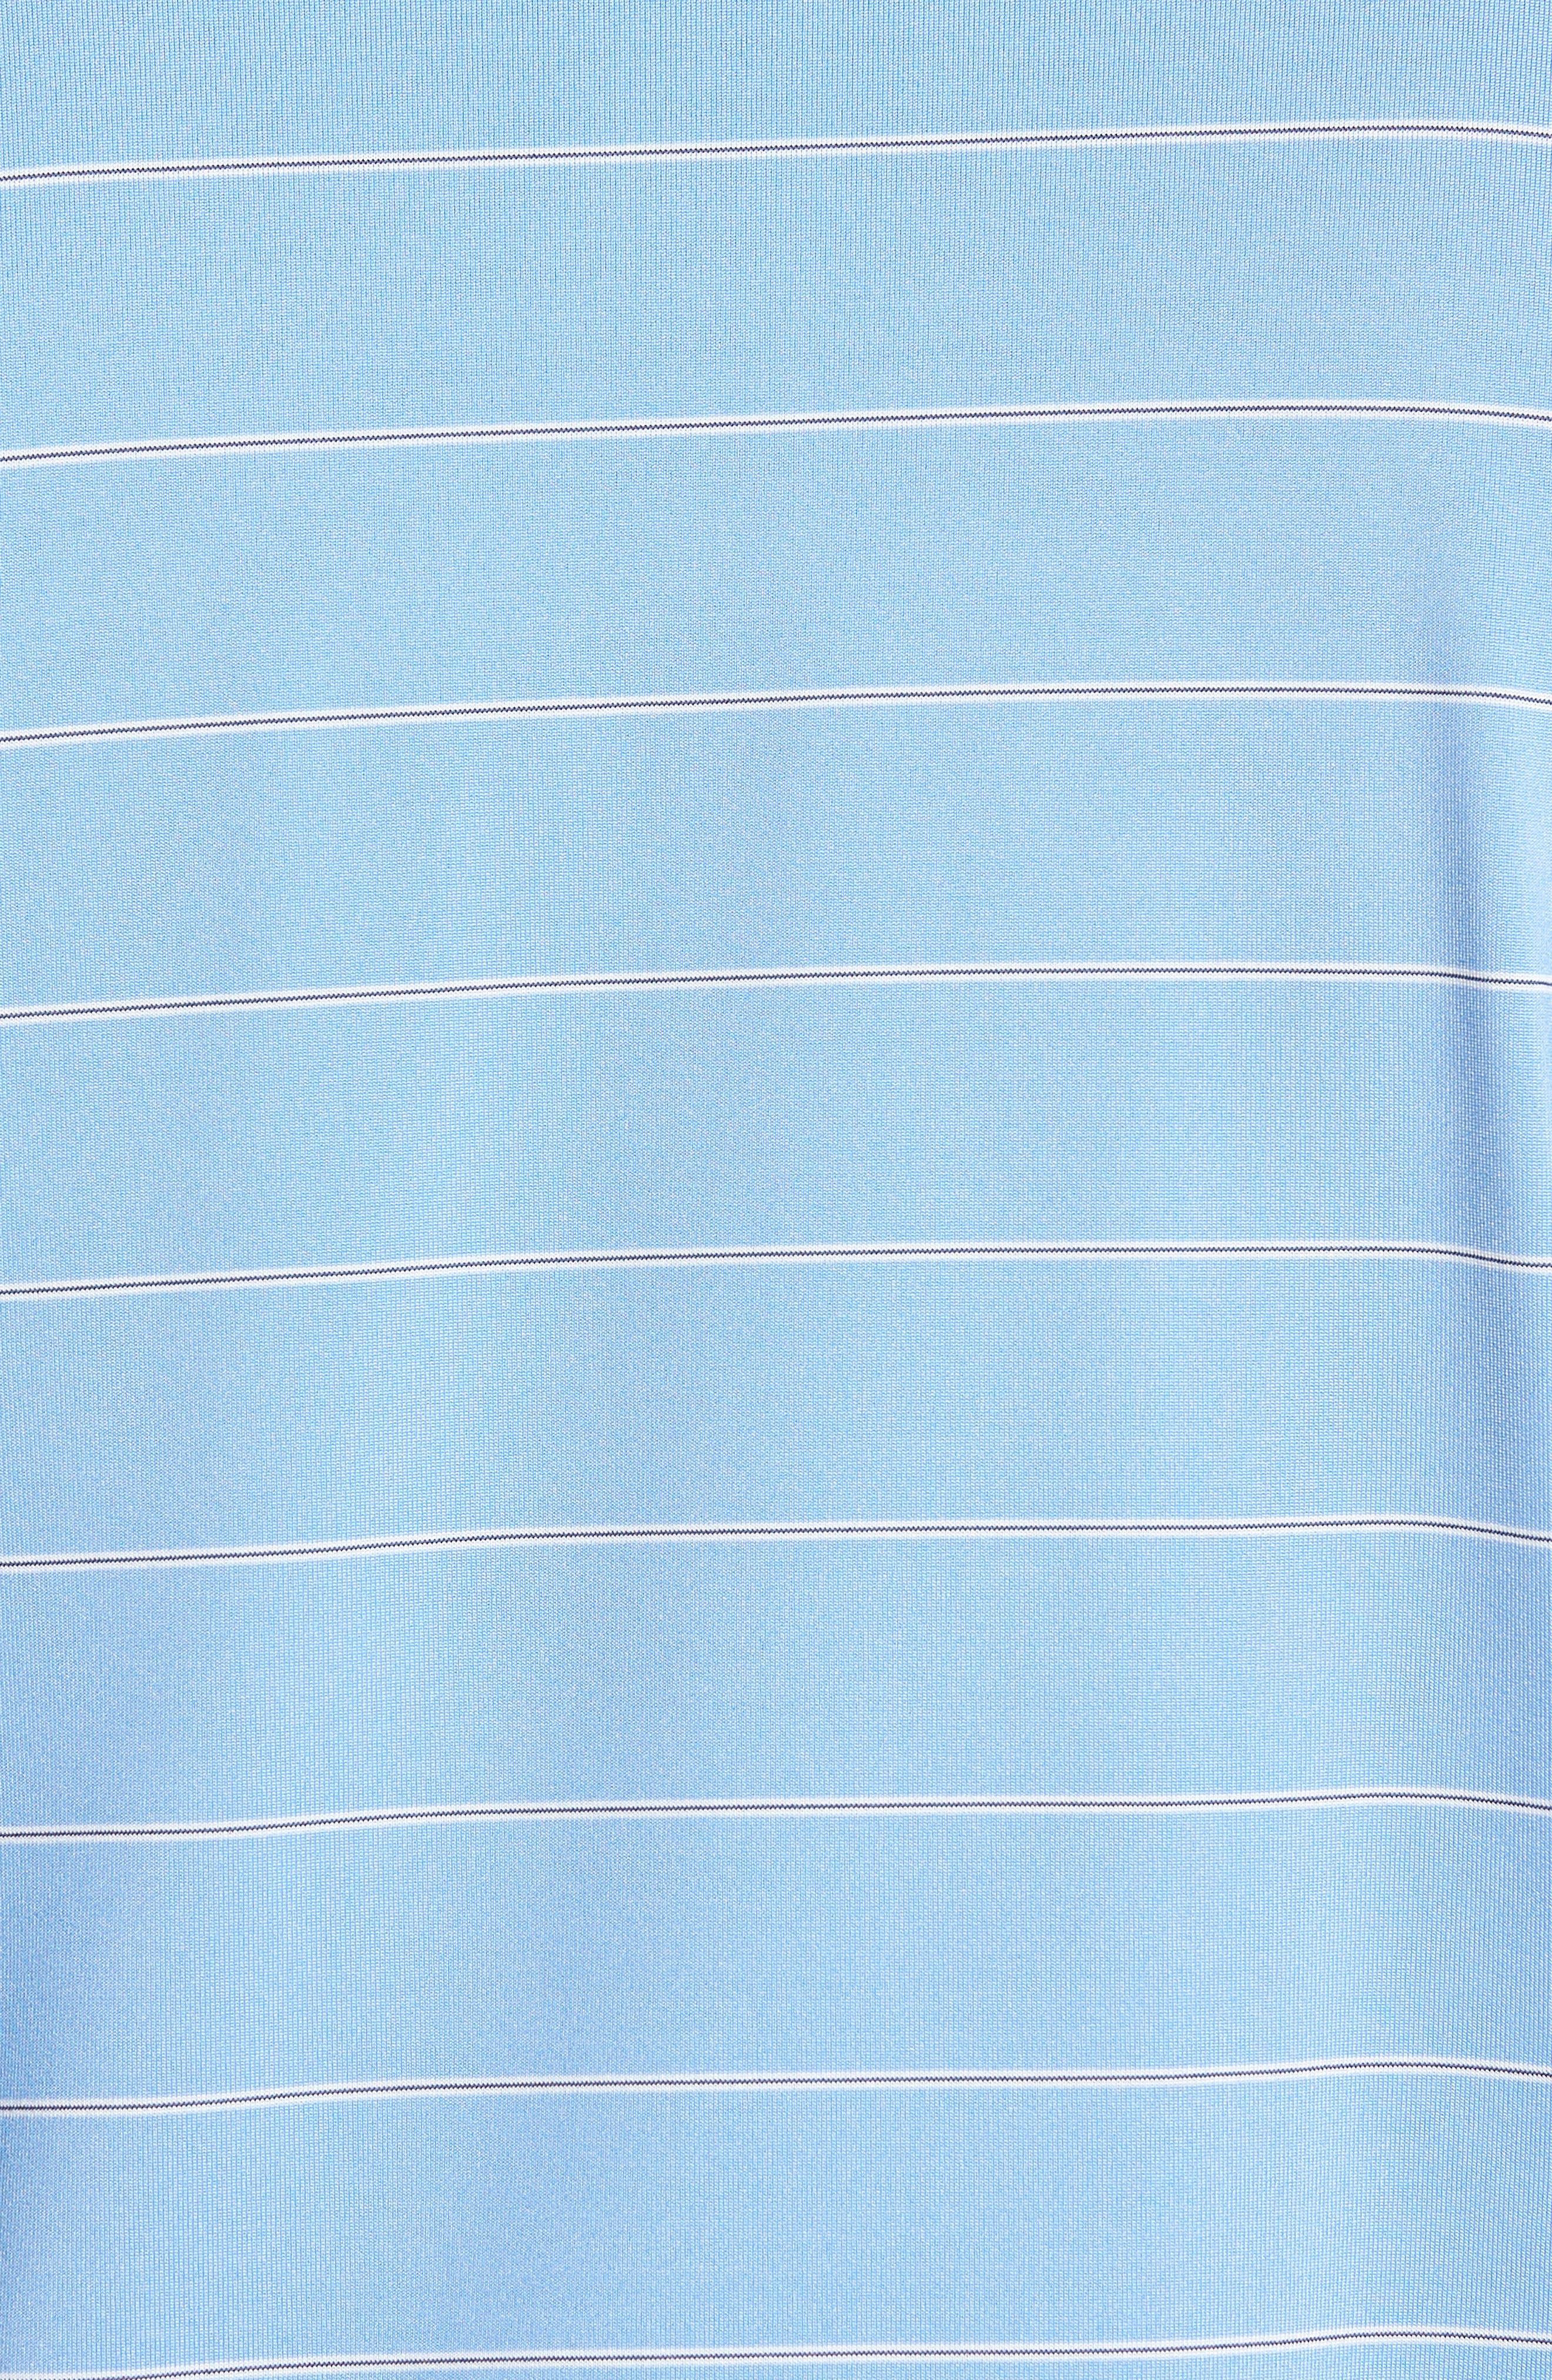 XH2O Momentum Stripe Jersey Polo,                             Alternate thumbnail 5, color,                             459